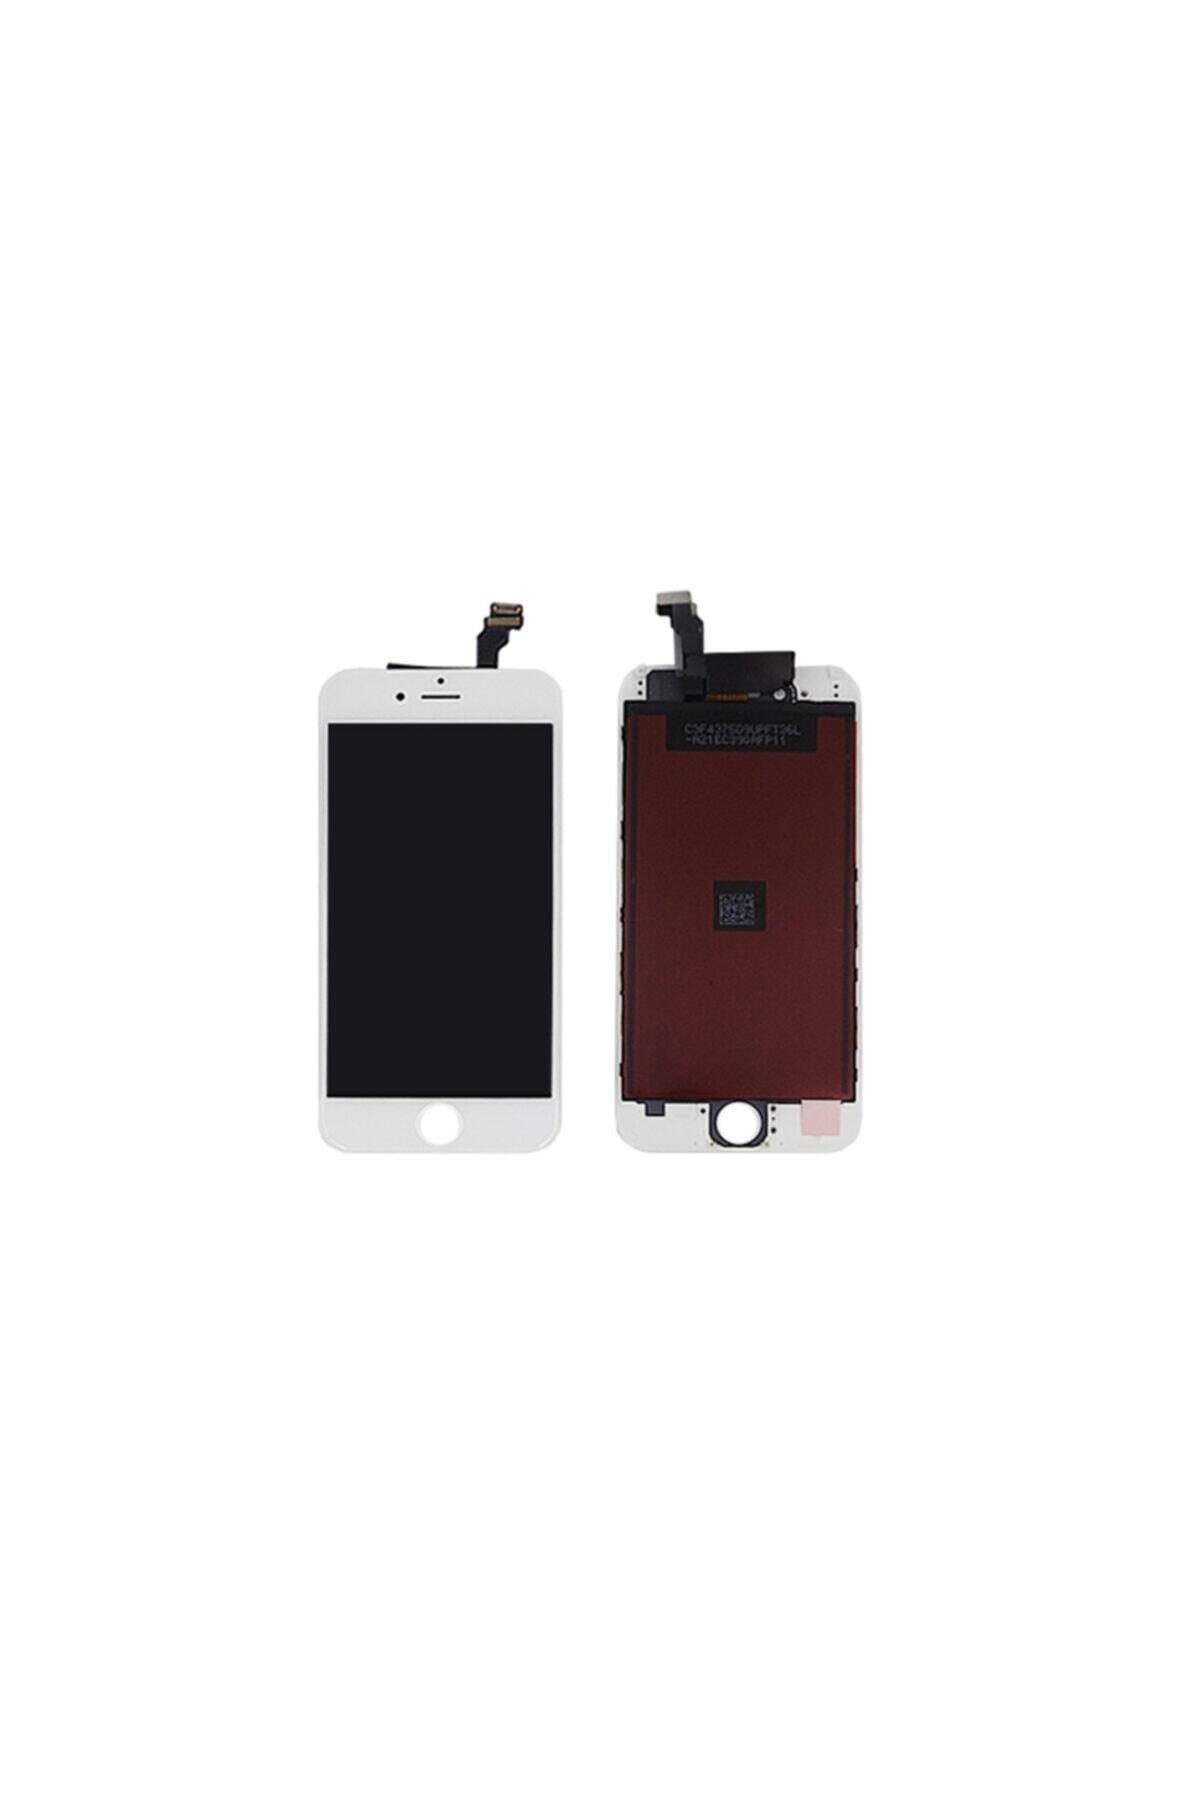 OEM Iphone 6 Beyaz Lcd Dokunmatik Ekran 1